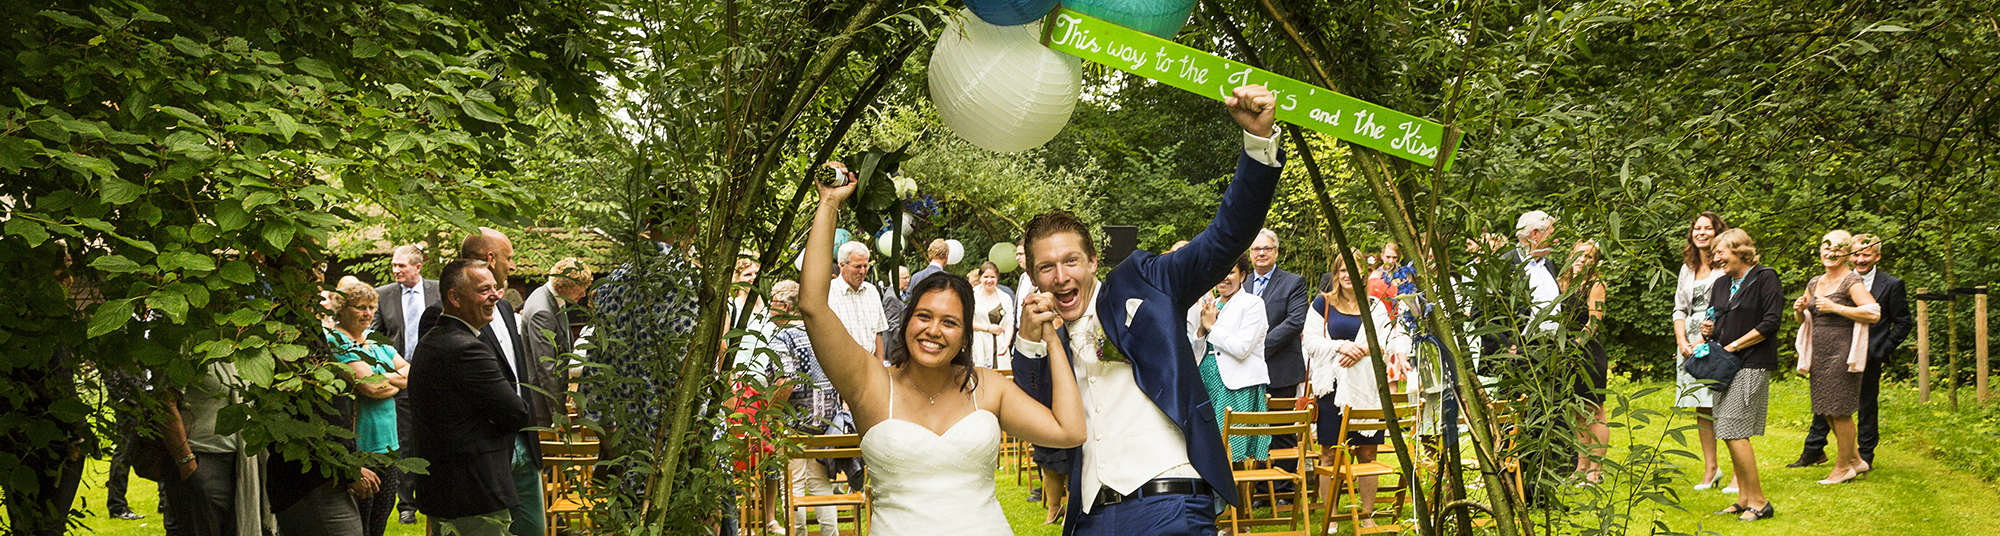 fotograaf gezocht bruiloft trouwen